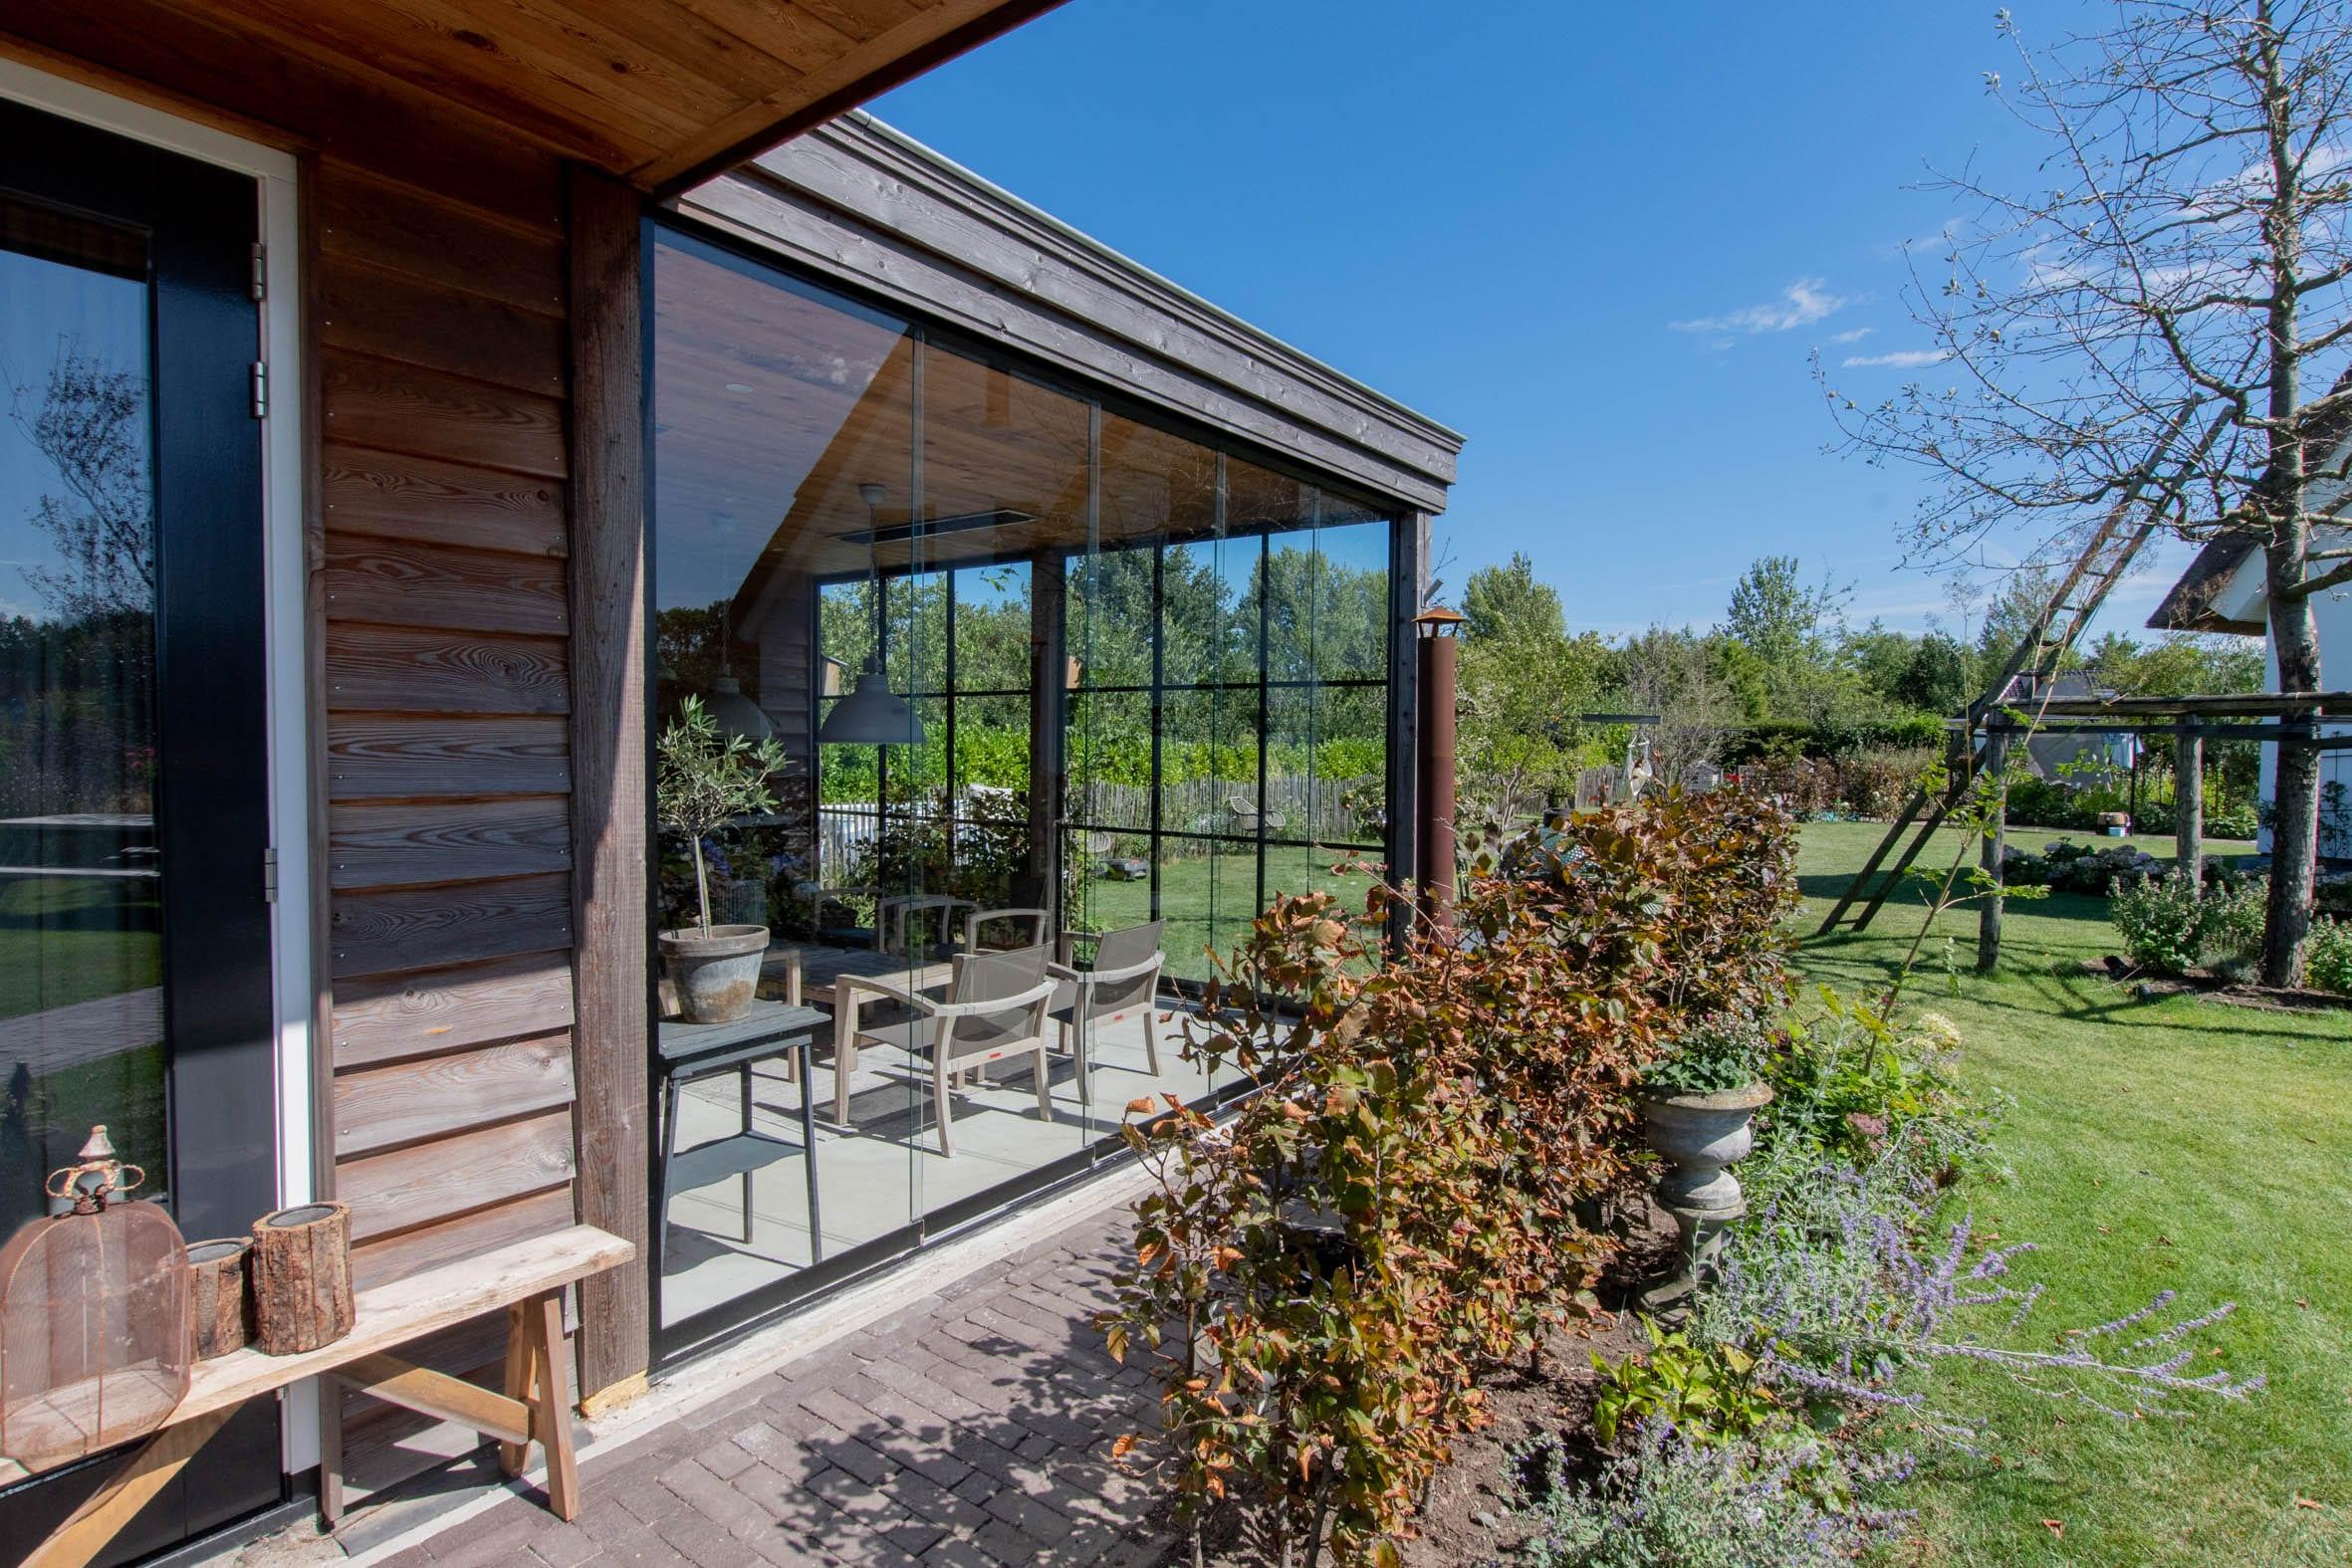 Gartenhaus Türen zum Schieben